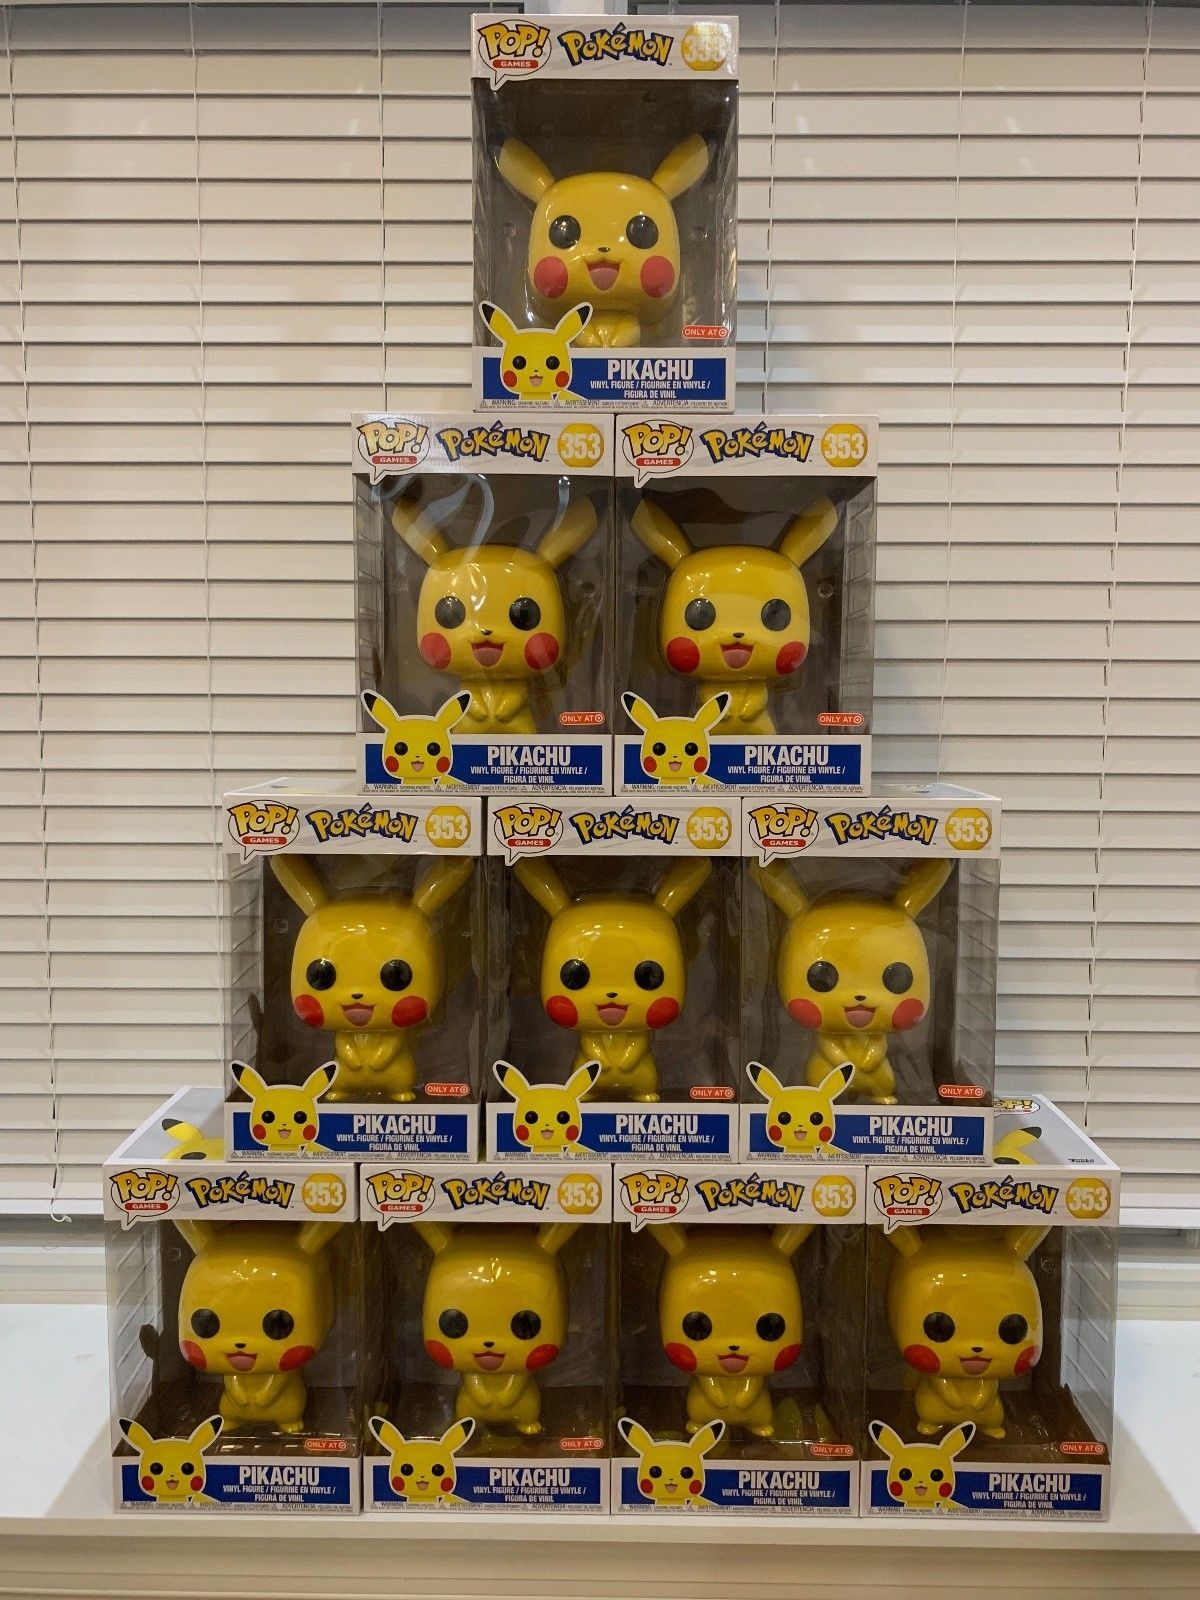 Funko Pop Pokemon Pikachu 10 Inch Target Exclusive Funko Funko Pop Pokemon